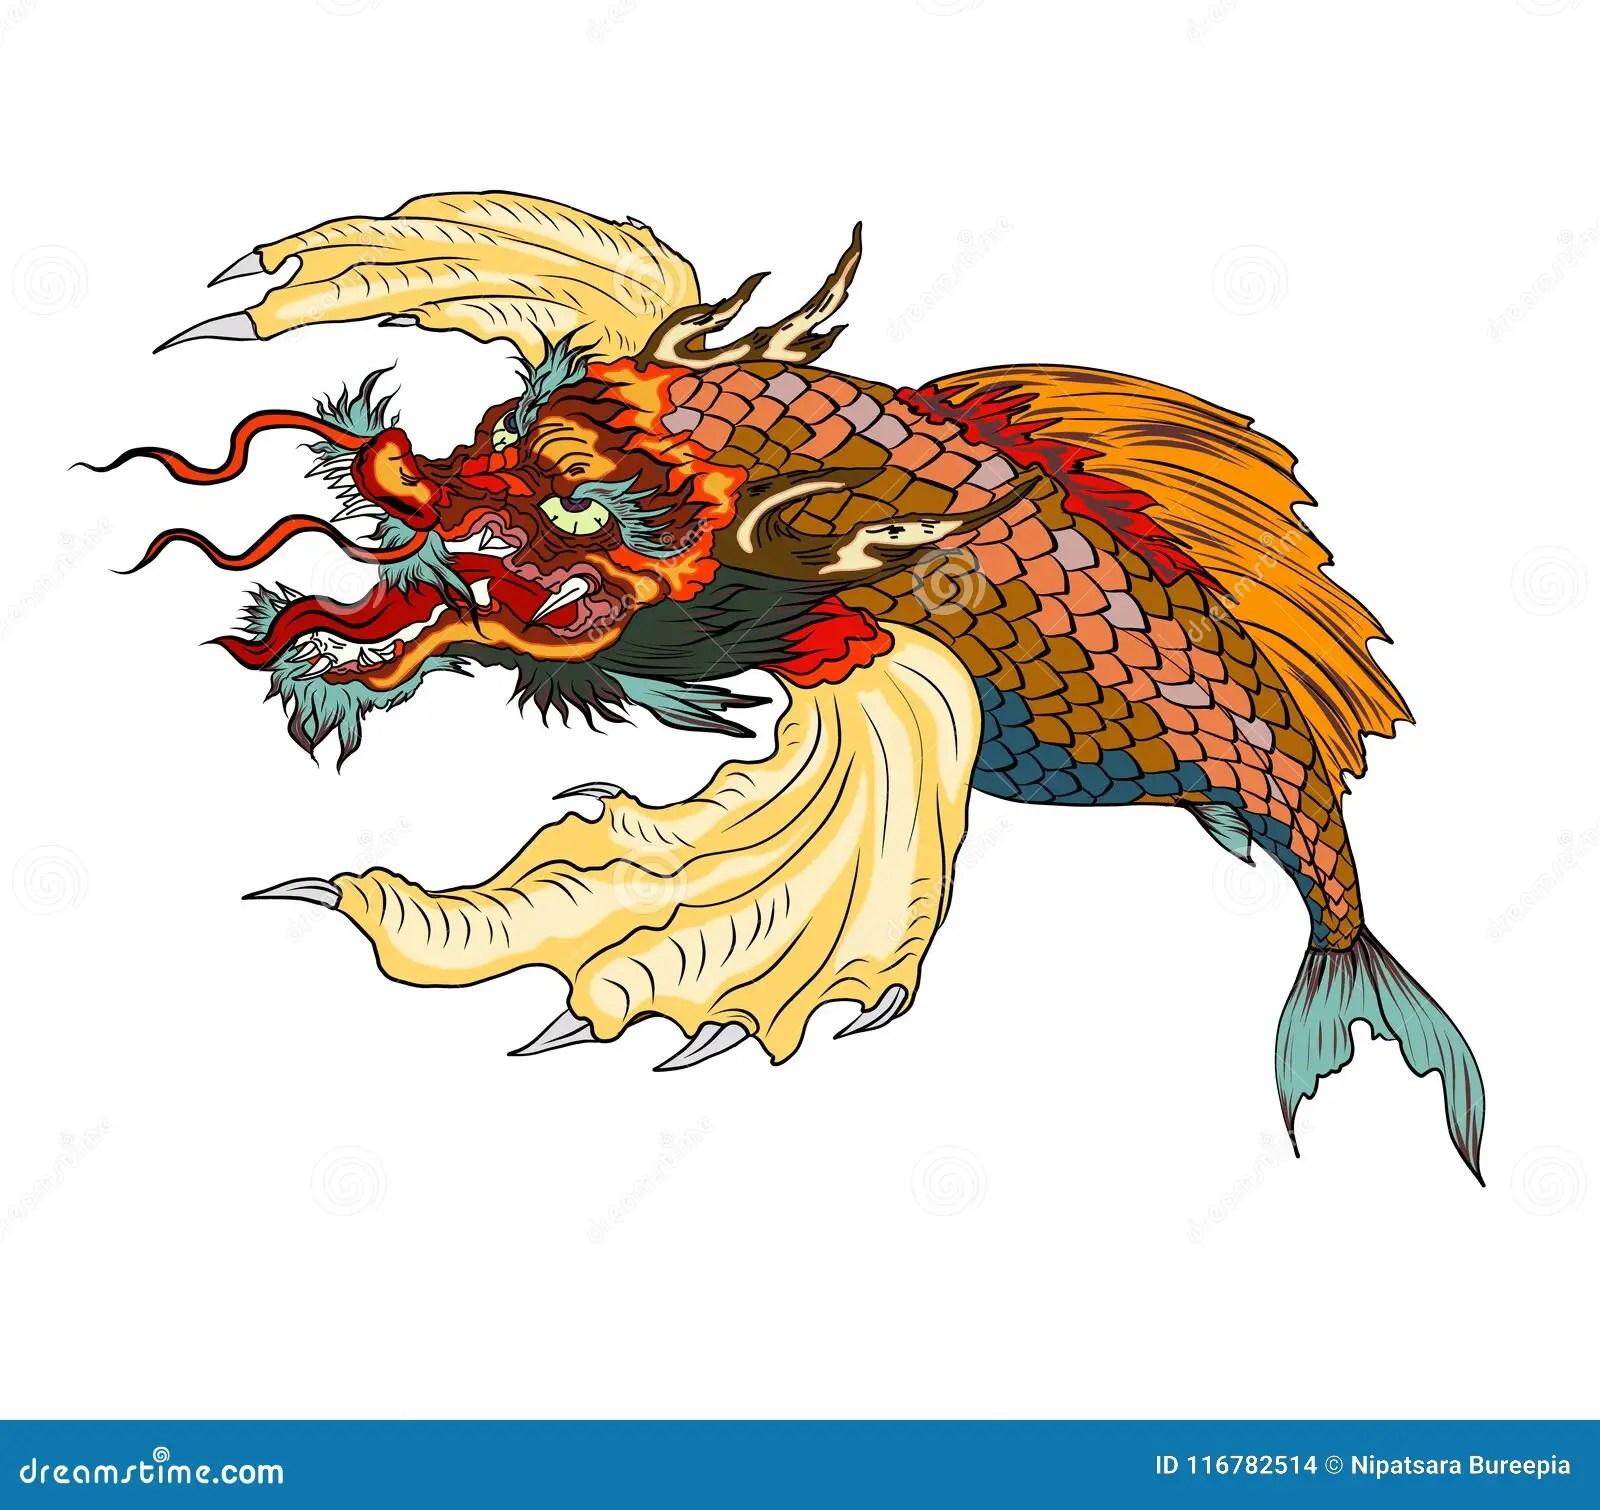 Dragon Head And Koi Carp Fish In Circle Design For Tattoo Stock Vector Illustration Of Fish Drawn 116782514